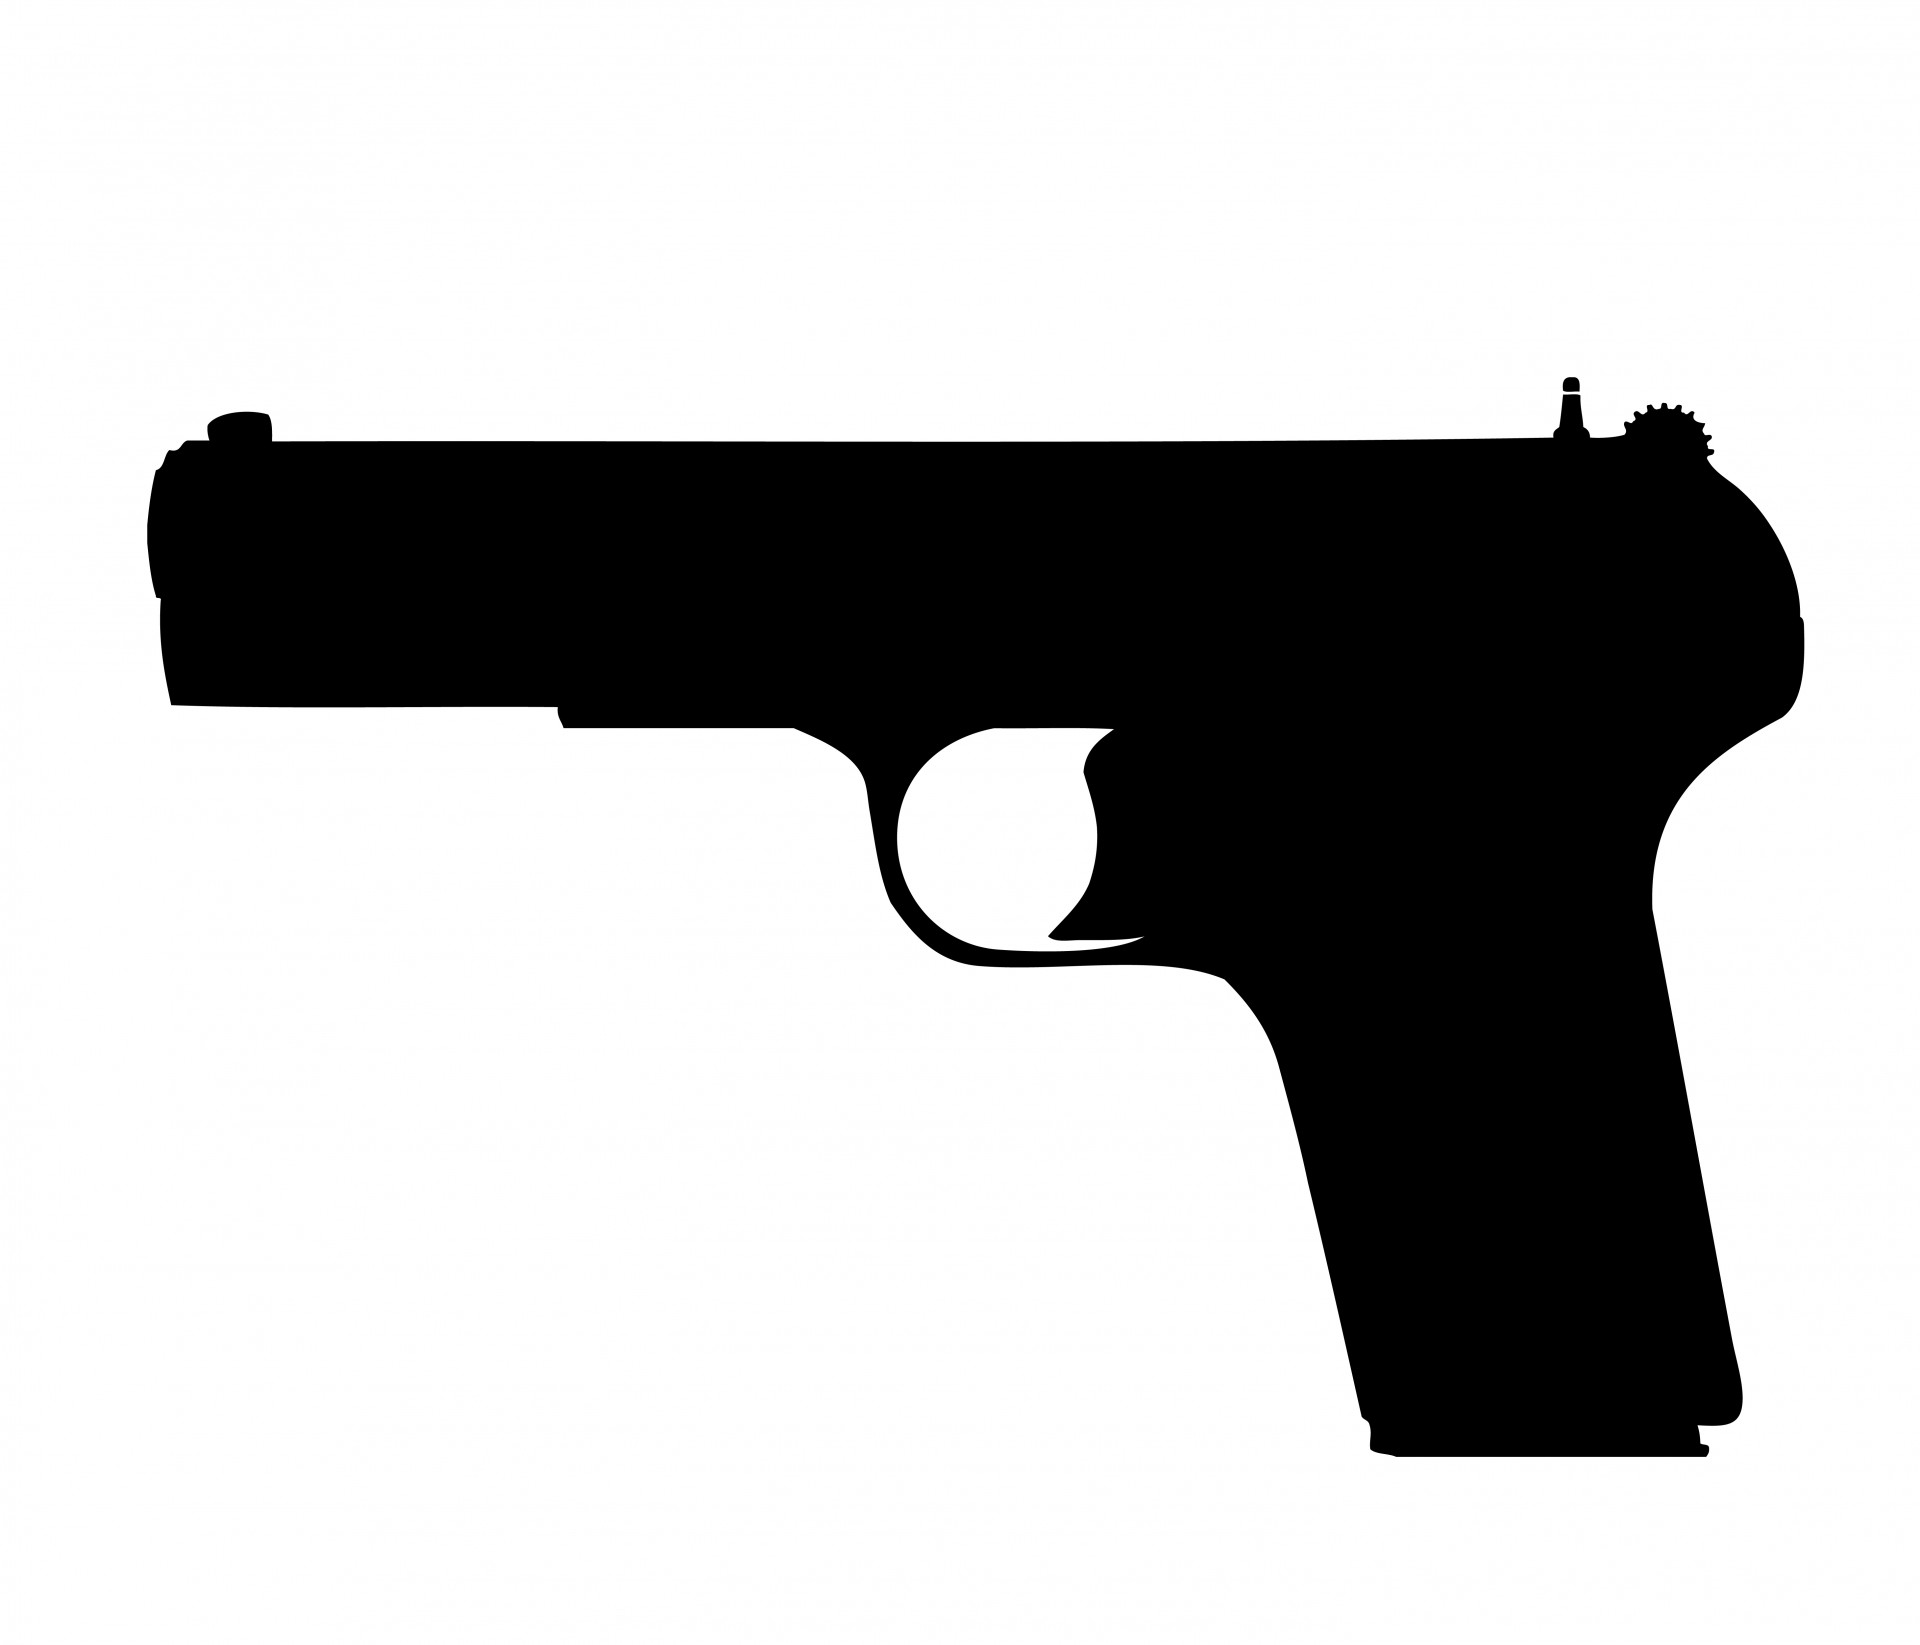 hight resolution of gun pistol clipart free stock photo